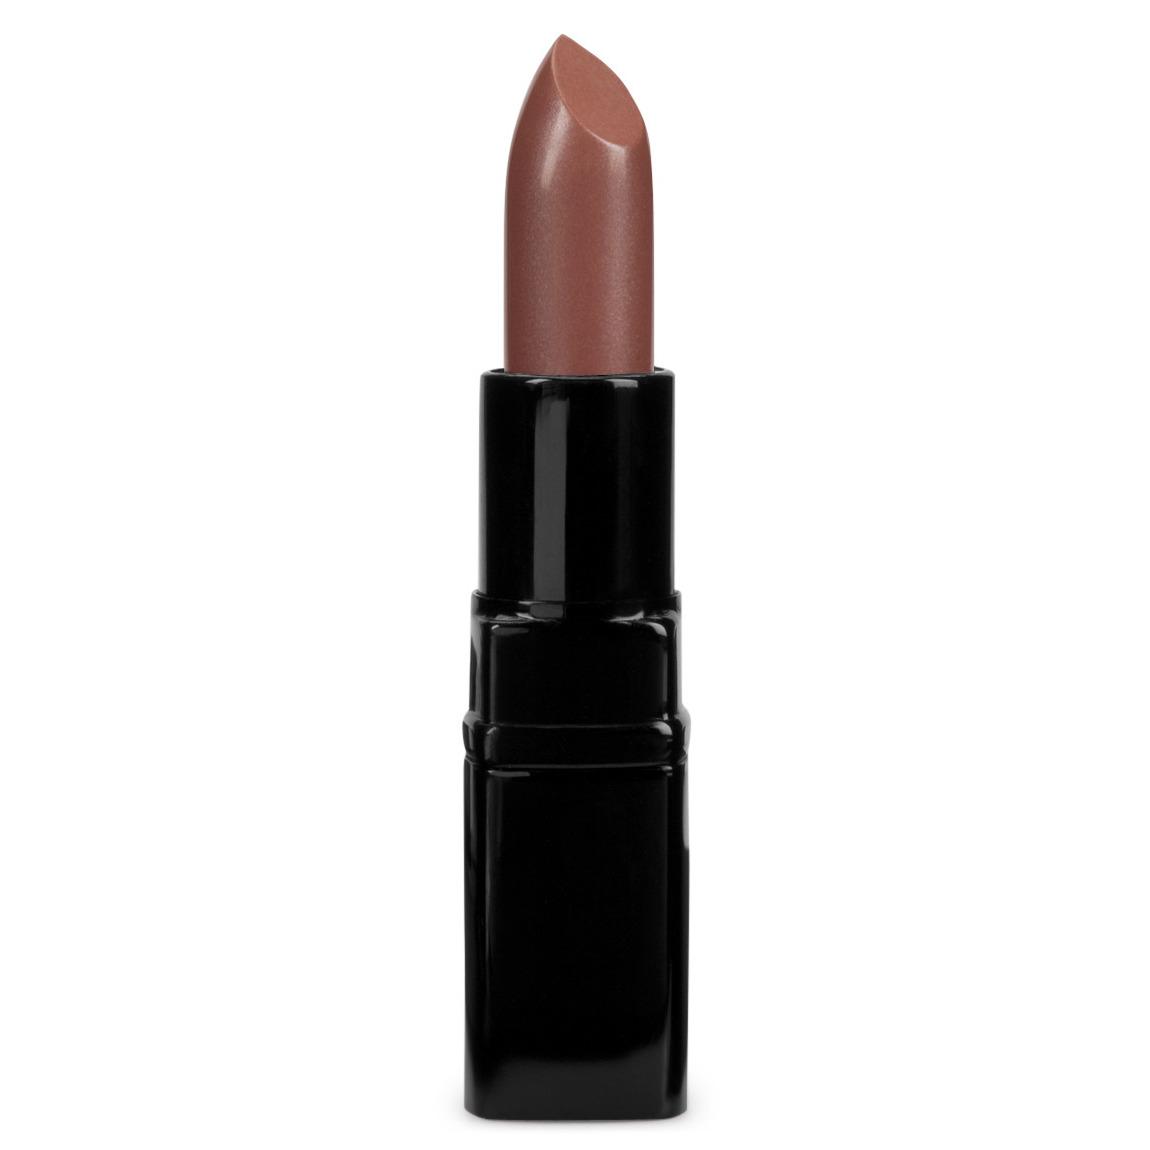 Inglot Cosmetics Lipstick 168 Cream